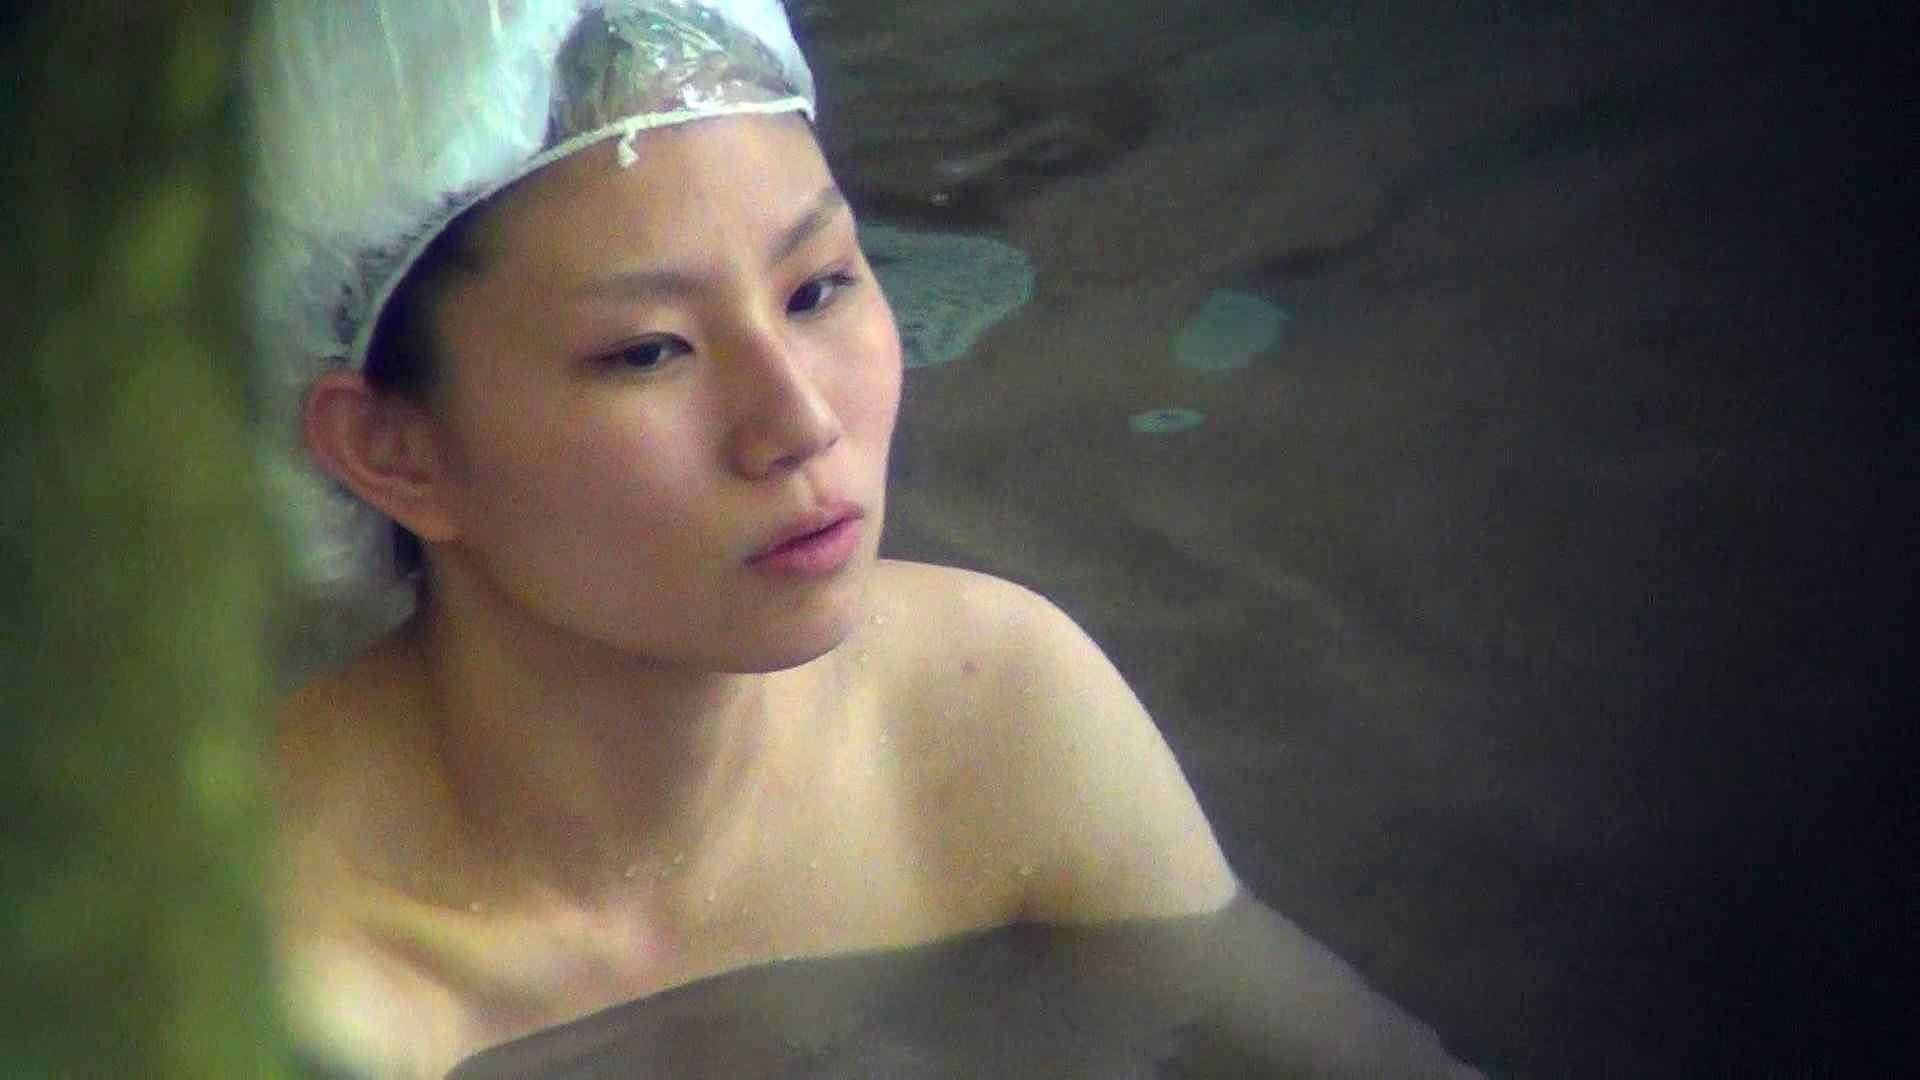 Vol.43 ヘアキャップをしても美しい中性的美女simai 美女 AV動画キャプチャ 110画像 47